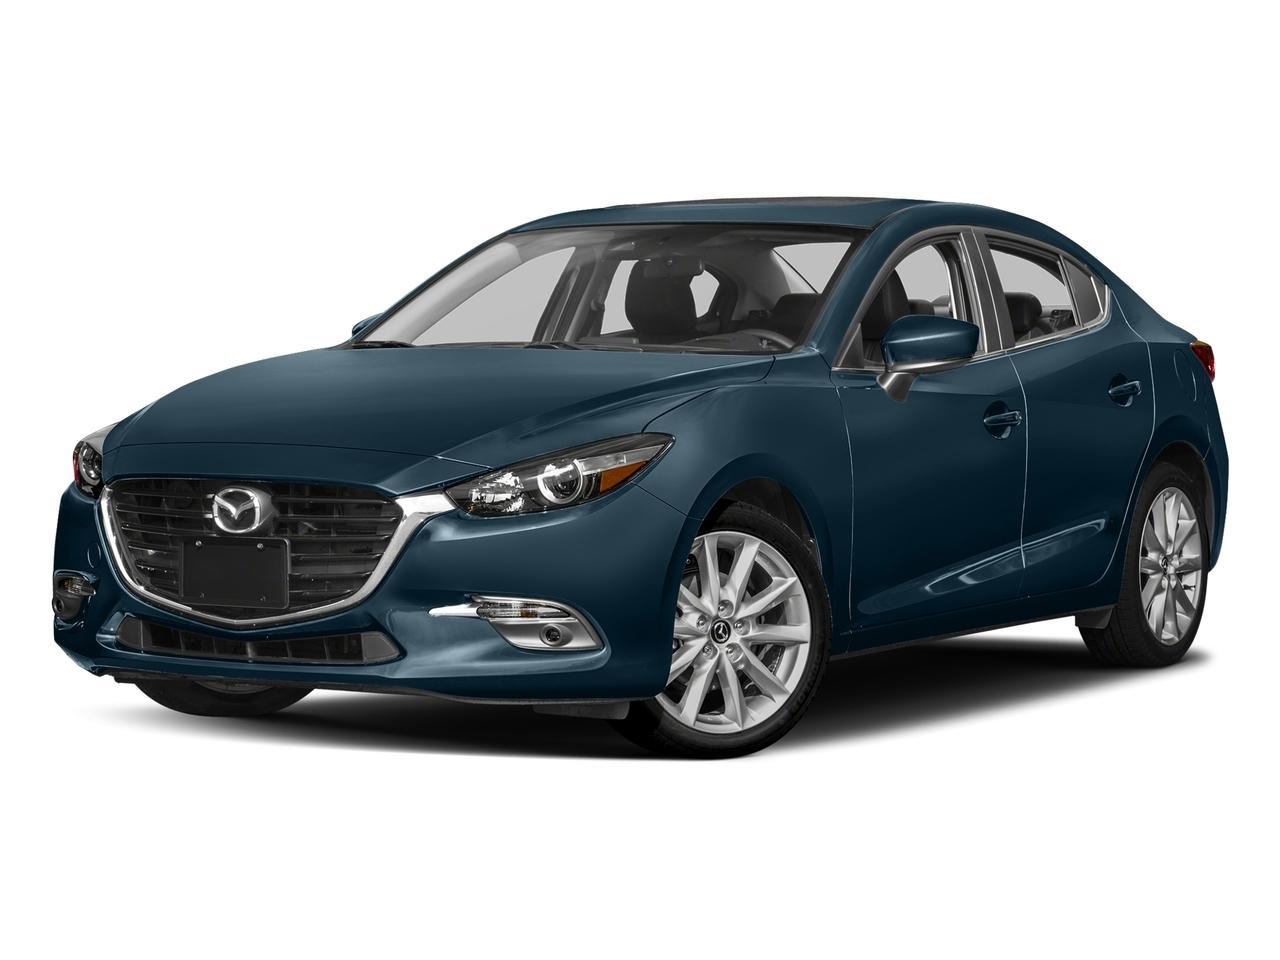 2017 Mazda3 4-Door Vehicle Photo in Plainfield, IL 60586